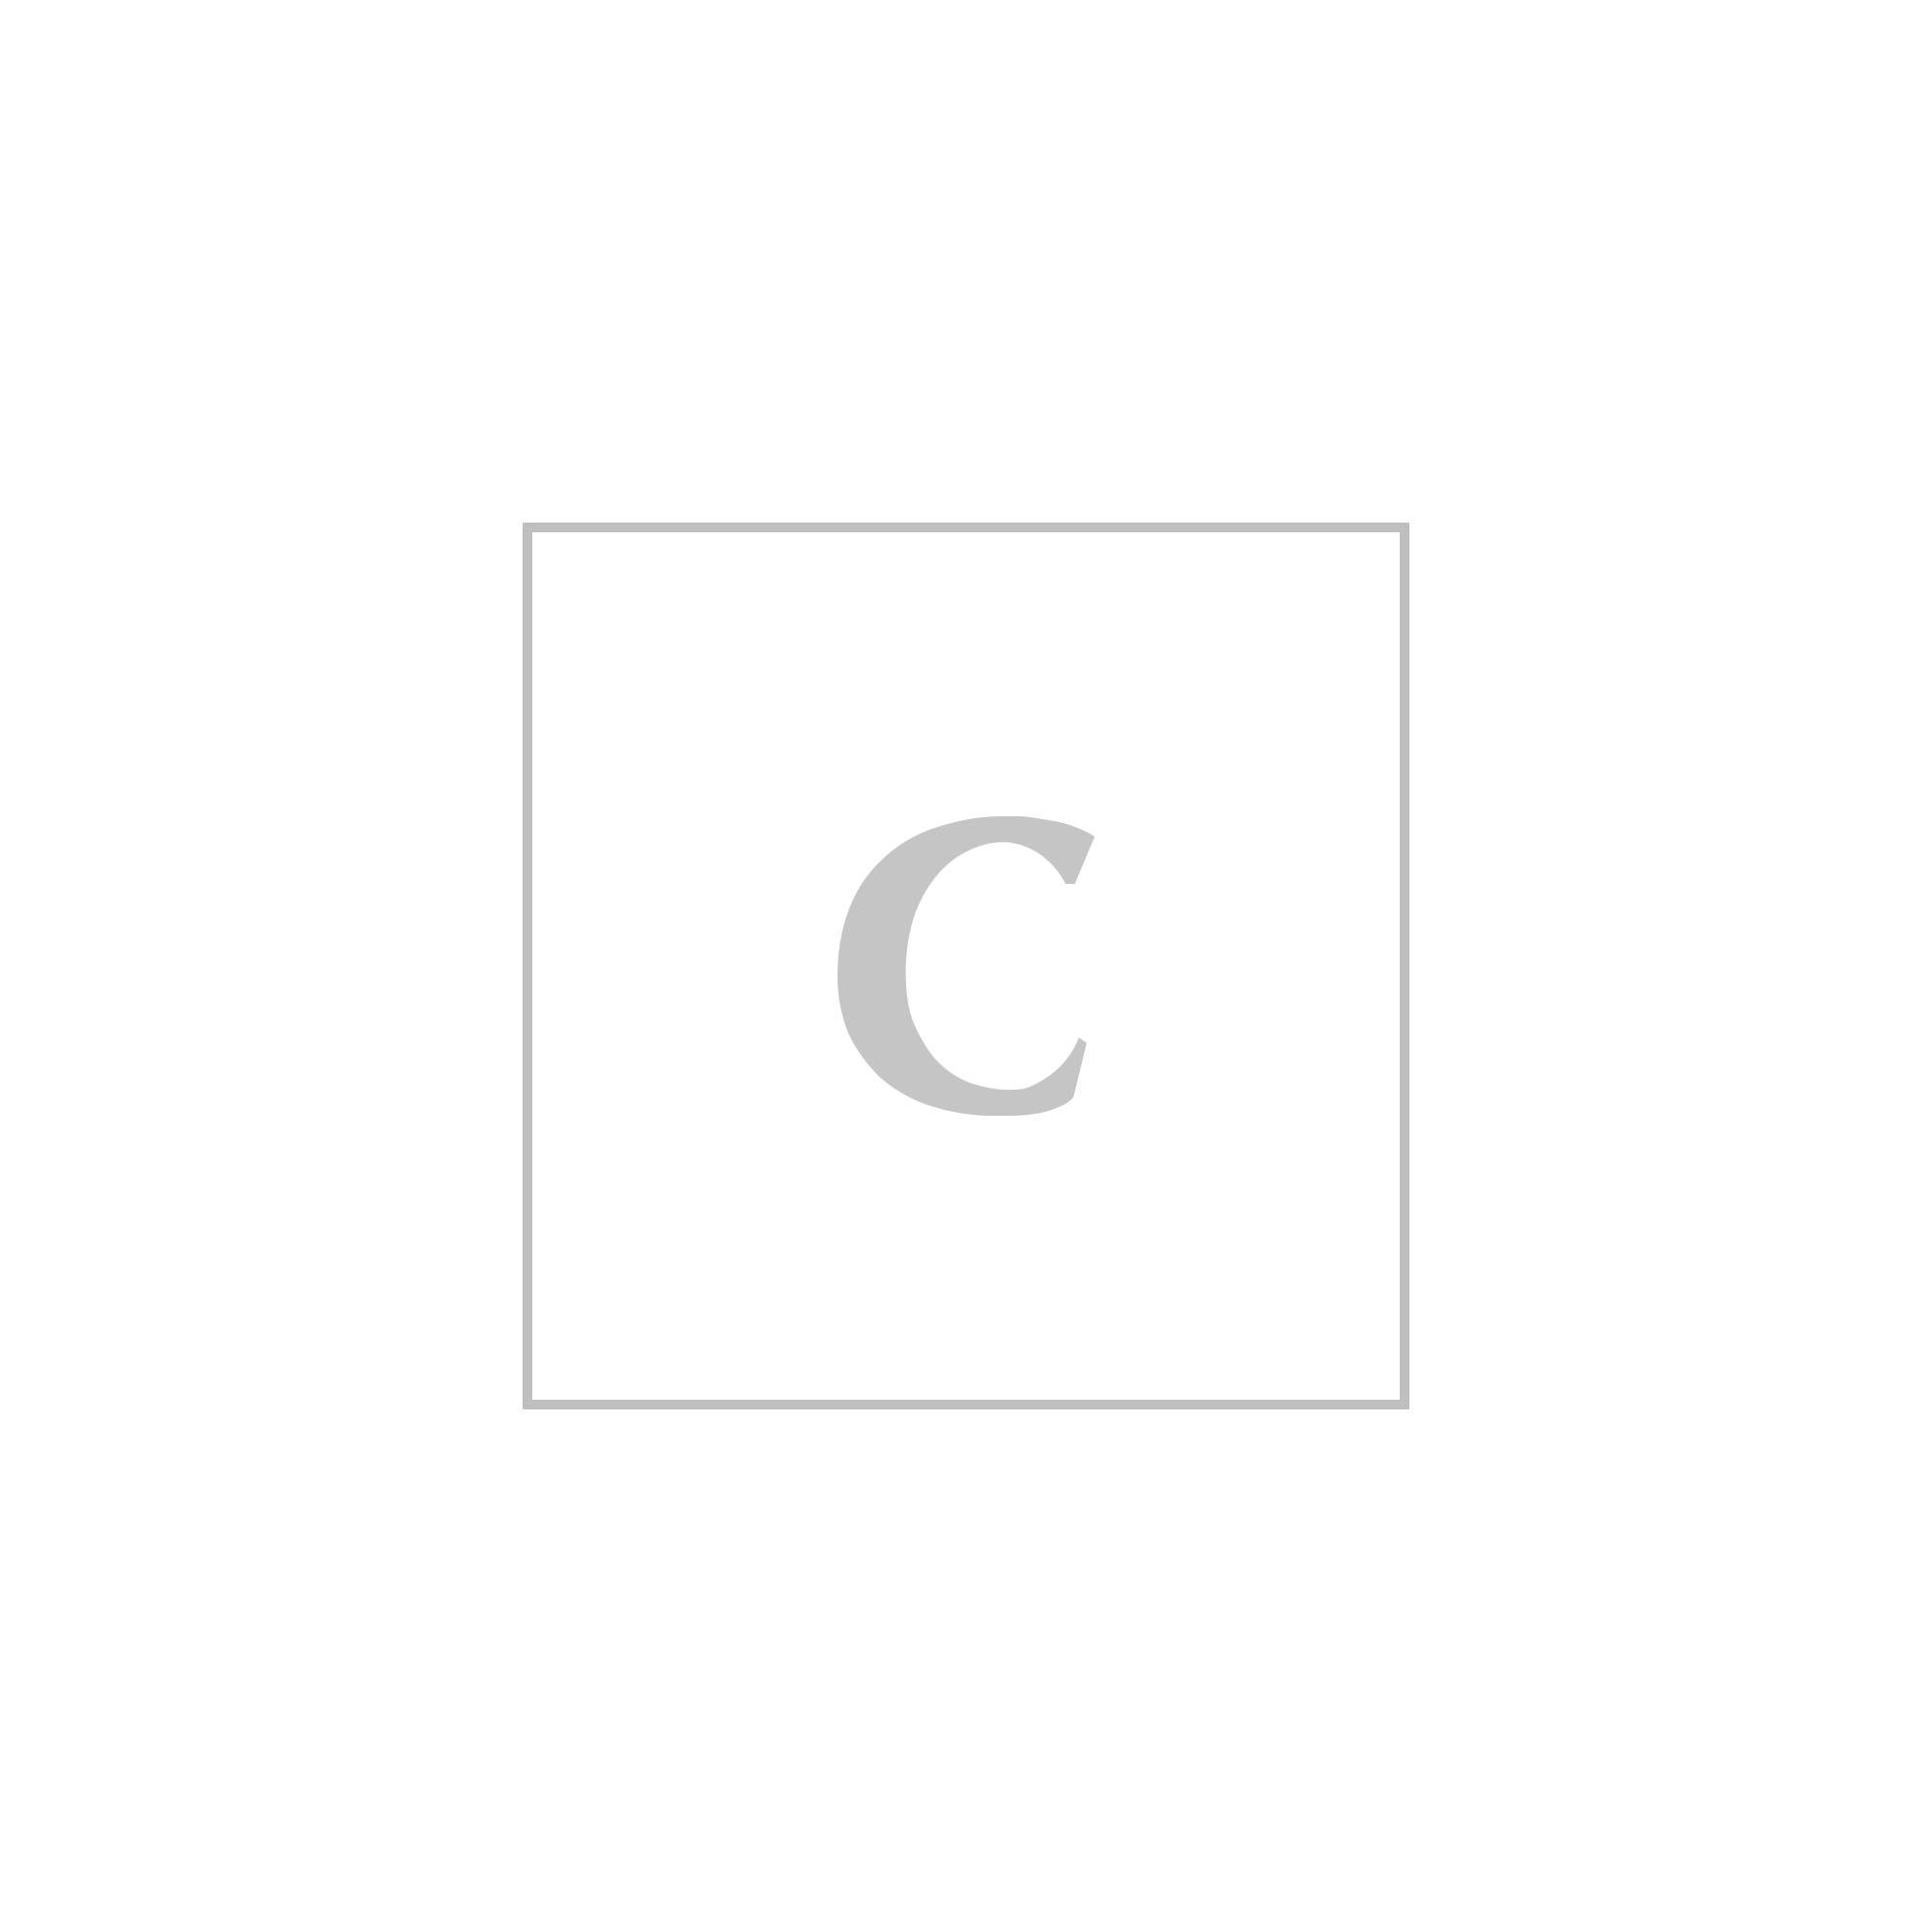 zaino nylon patch logo borse uomo